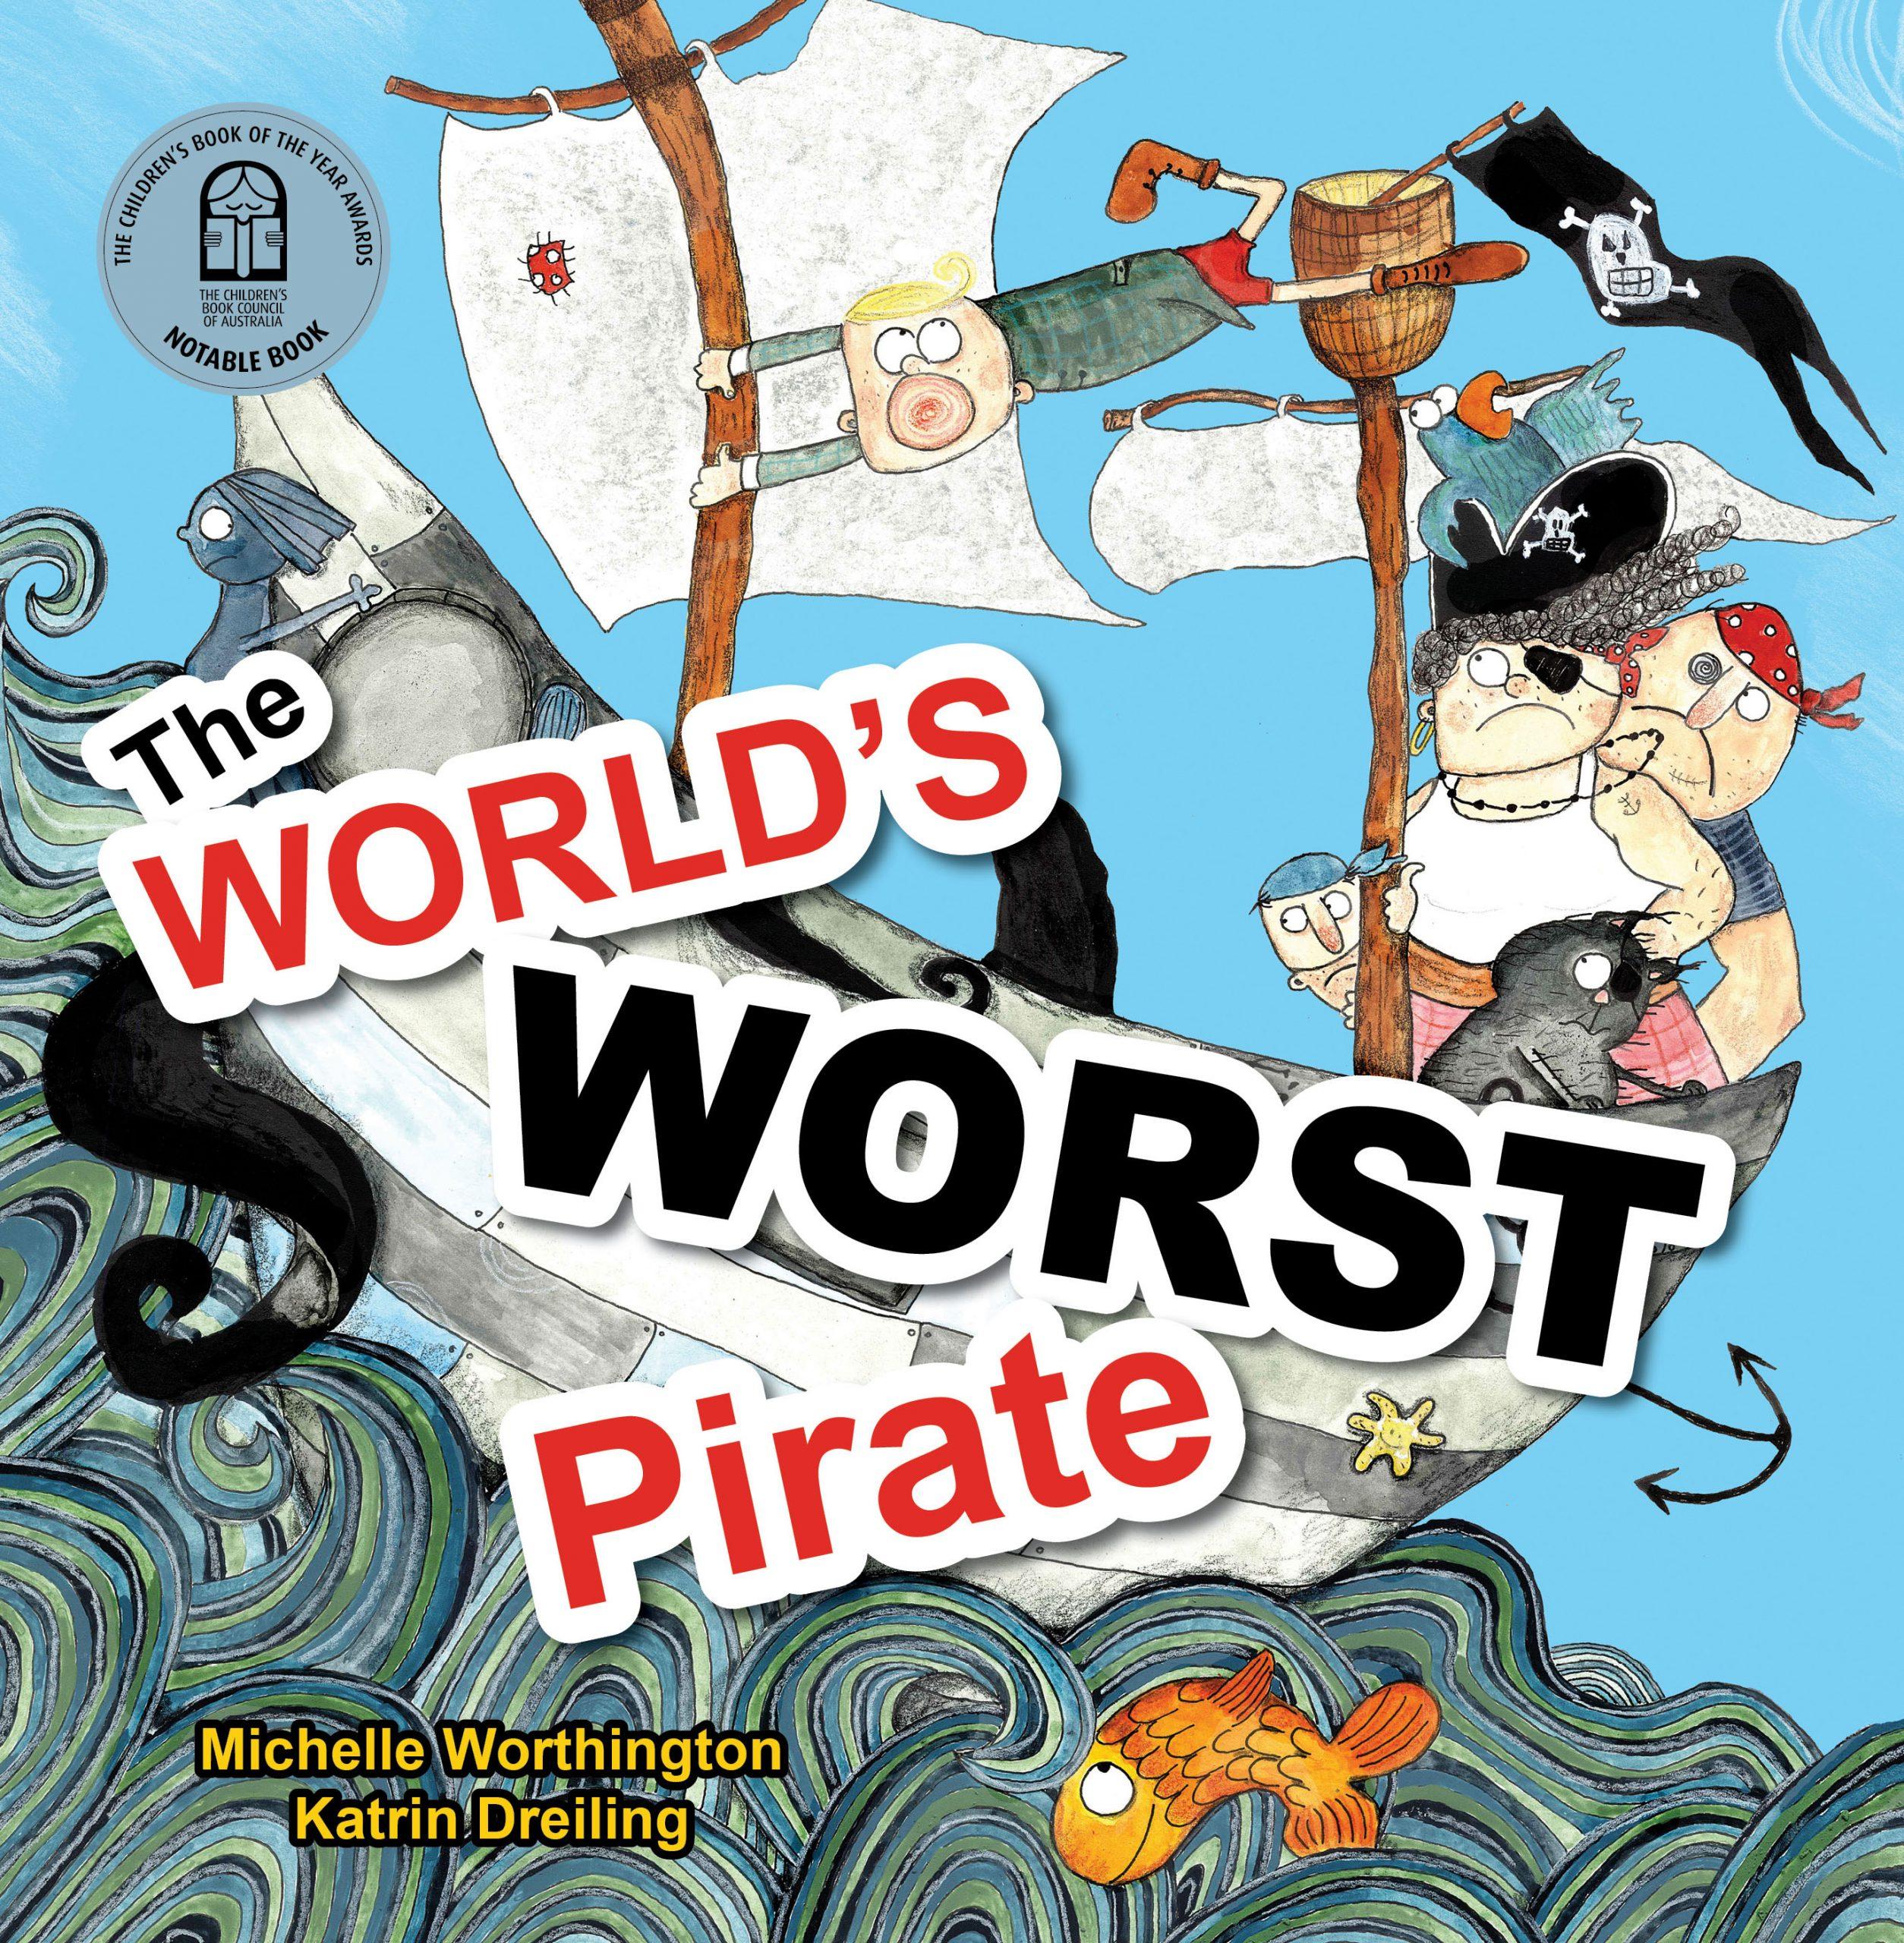 The World's Worst Pirate